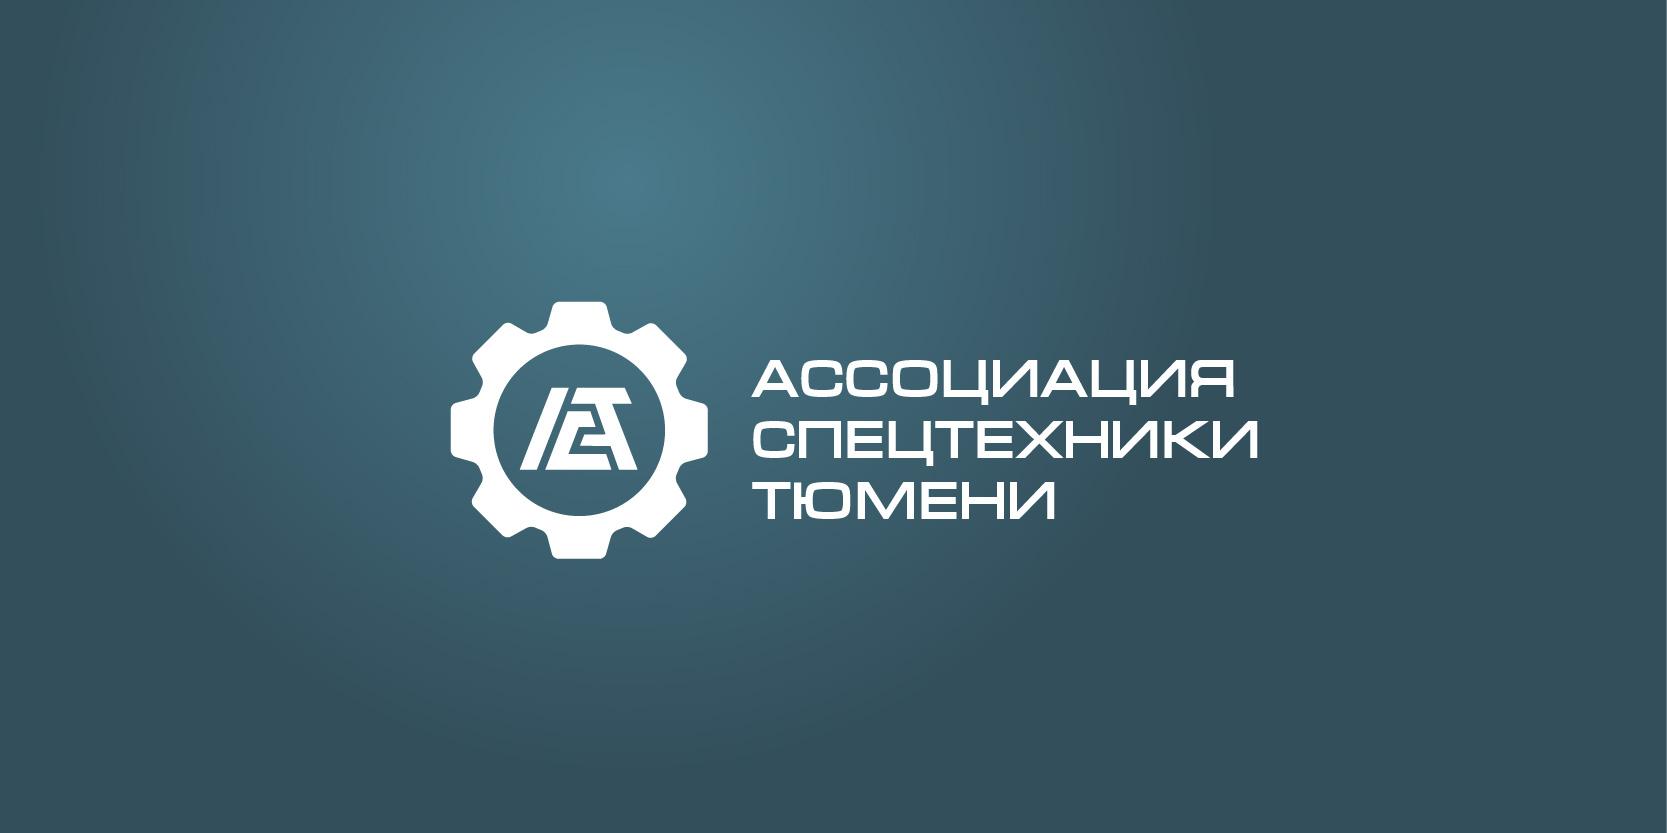 Логотип для Ассоциации спецтехники фото f_6625145f1f8d47e8.jpg